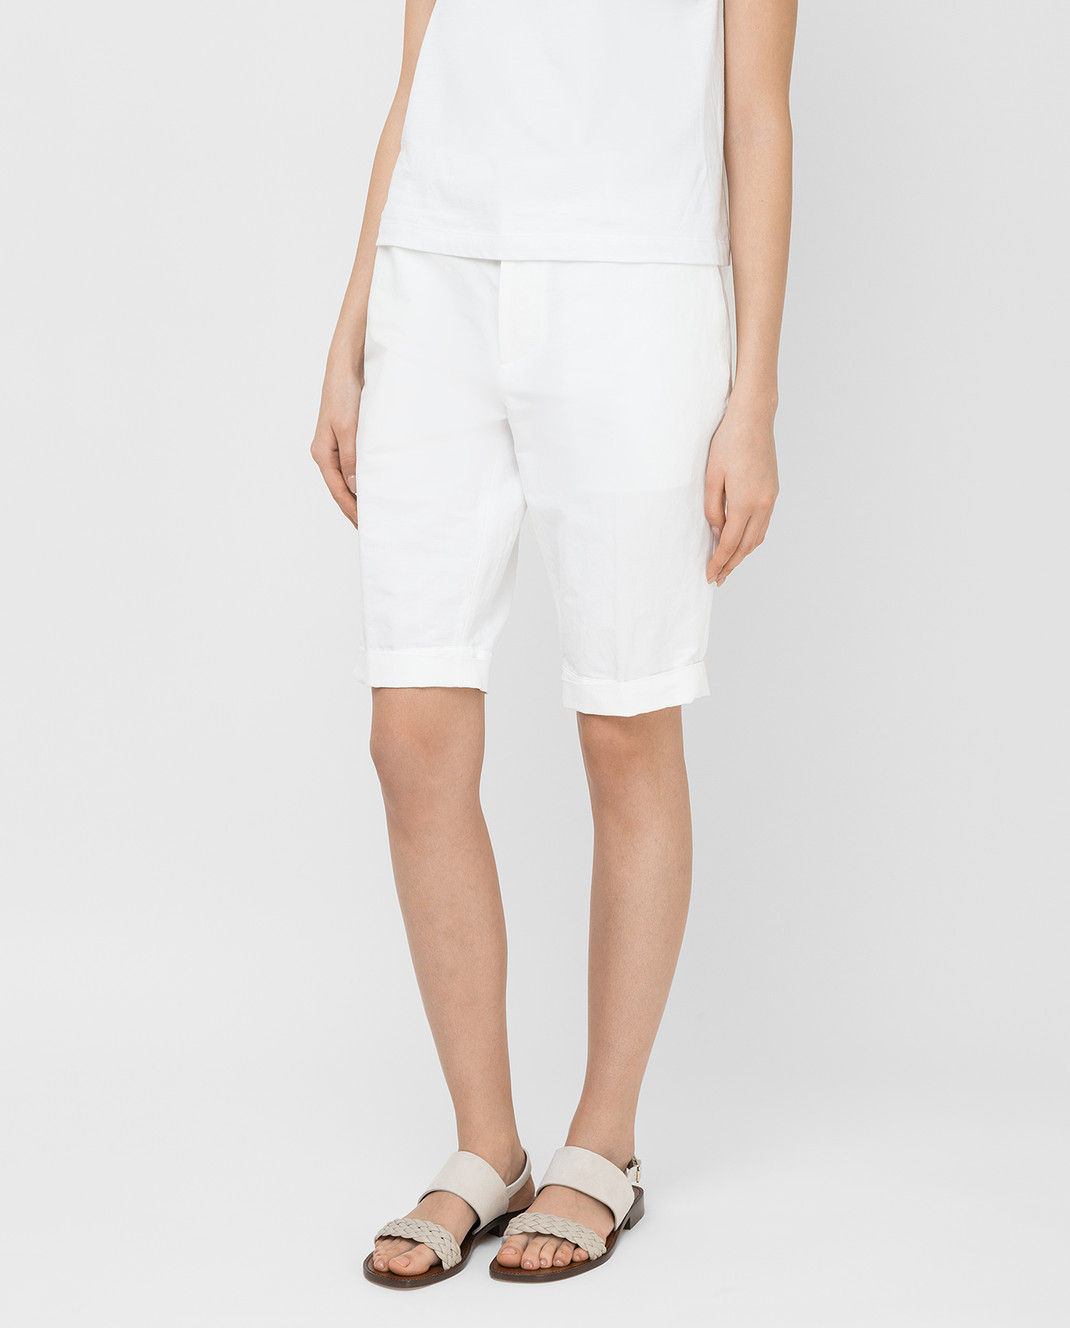 Marni Белые шорты PAMAN47A10TL234 изображение 3